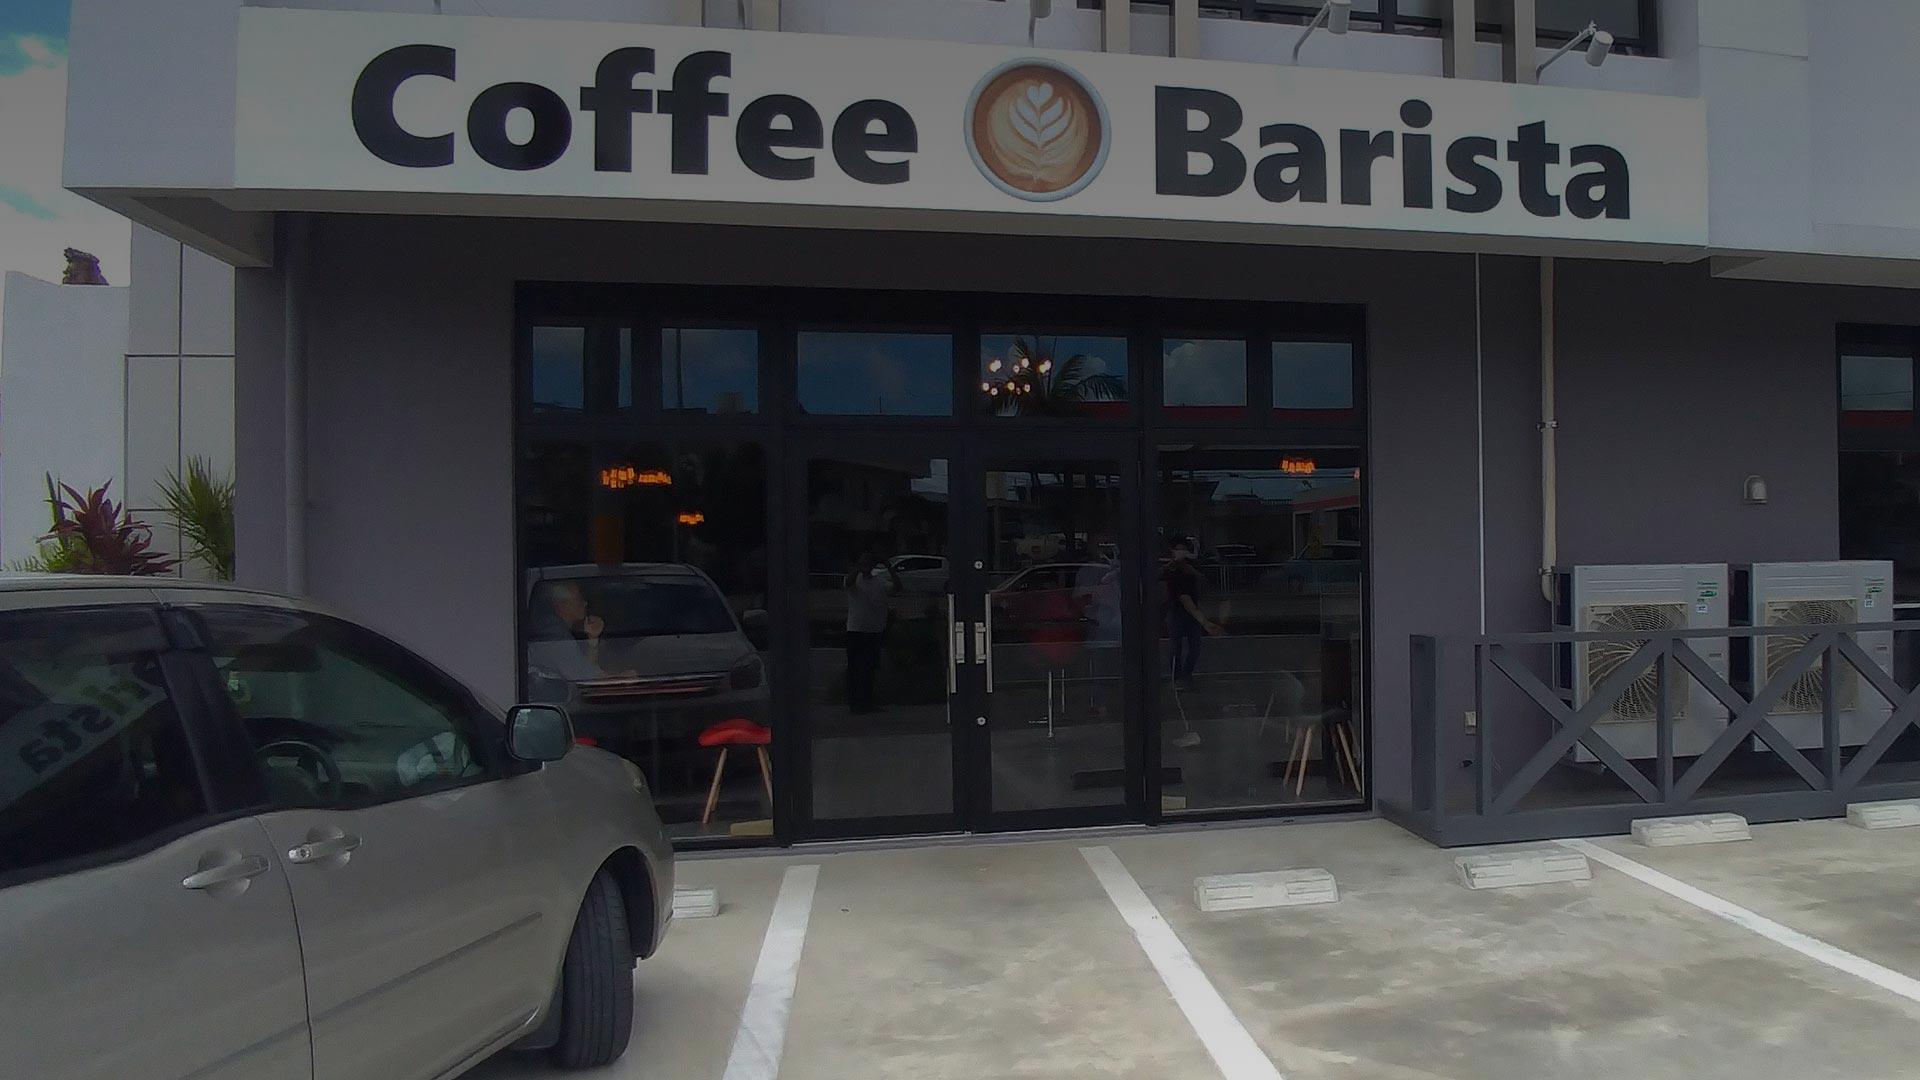 Coffee Barista shop